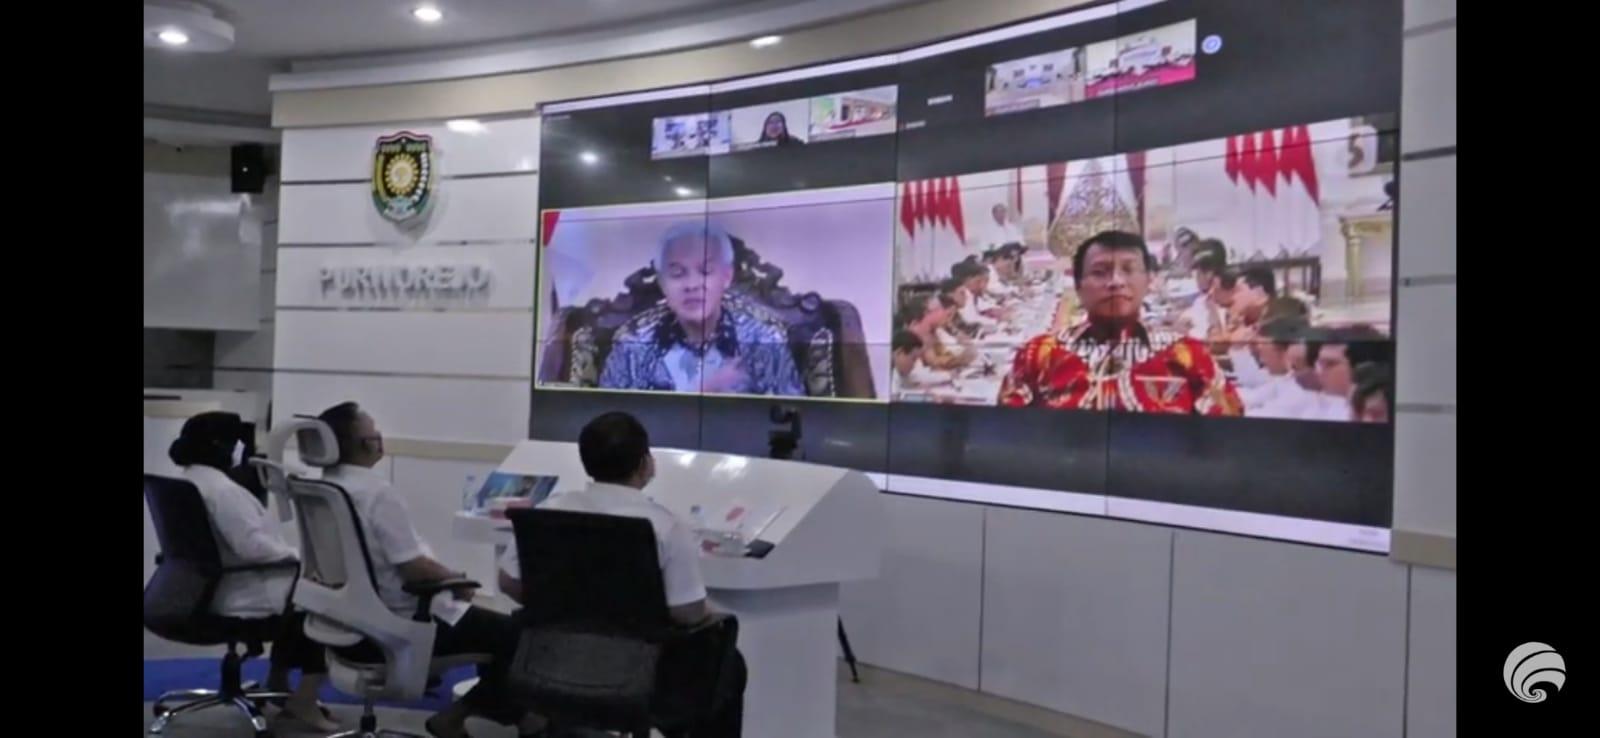 Tangkap layar youtube diskominfo Purworejo, Rakor rapat koordinasi (rakor) secara daring, Rabu (8/9/2021). Foto: Rezanda Akbar/Lingkar.co